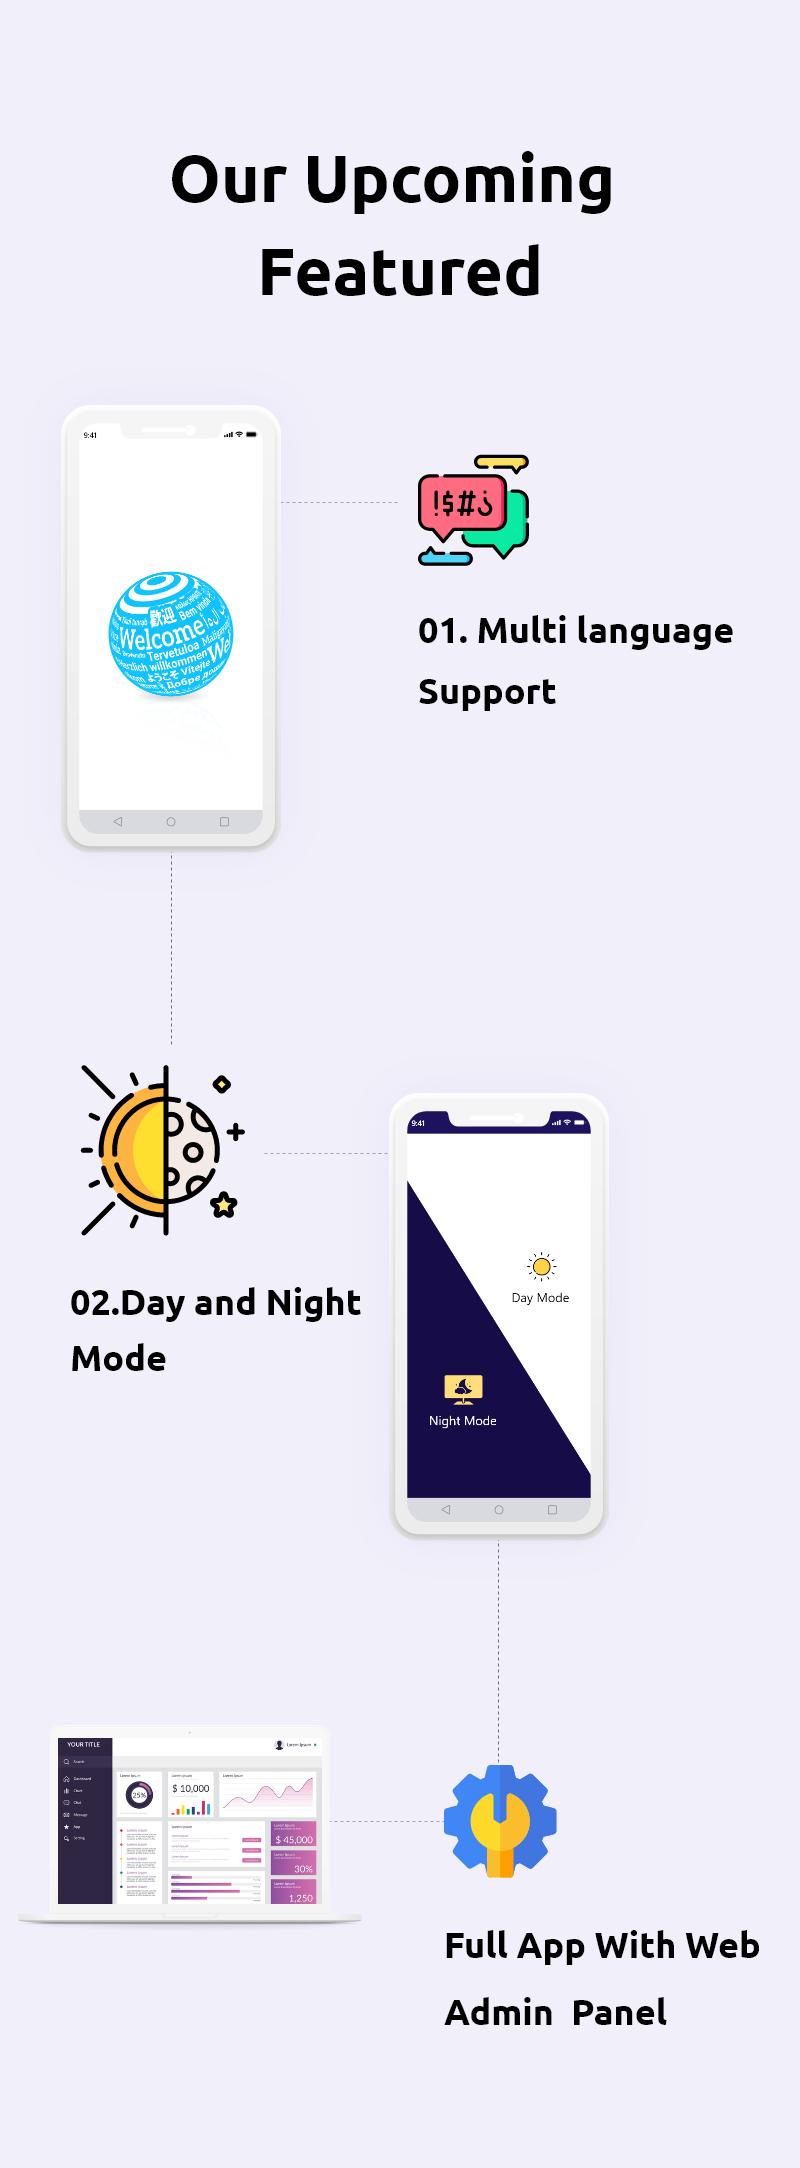 Billetera - Mobile eWallet App UI Kit in Flutter - 3